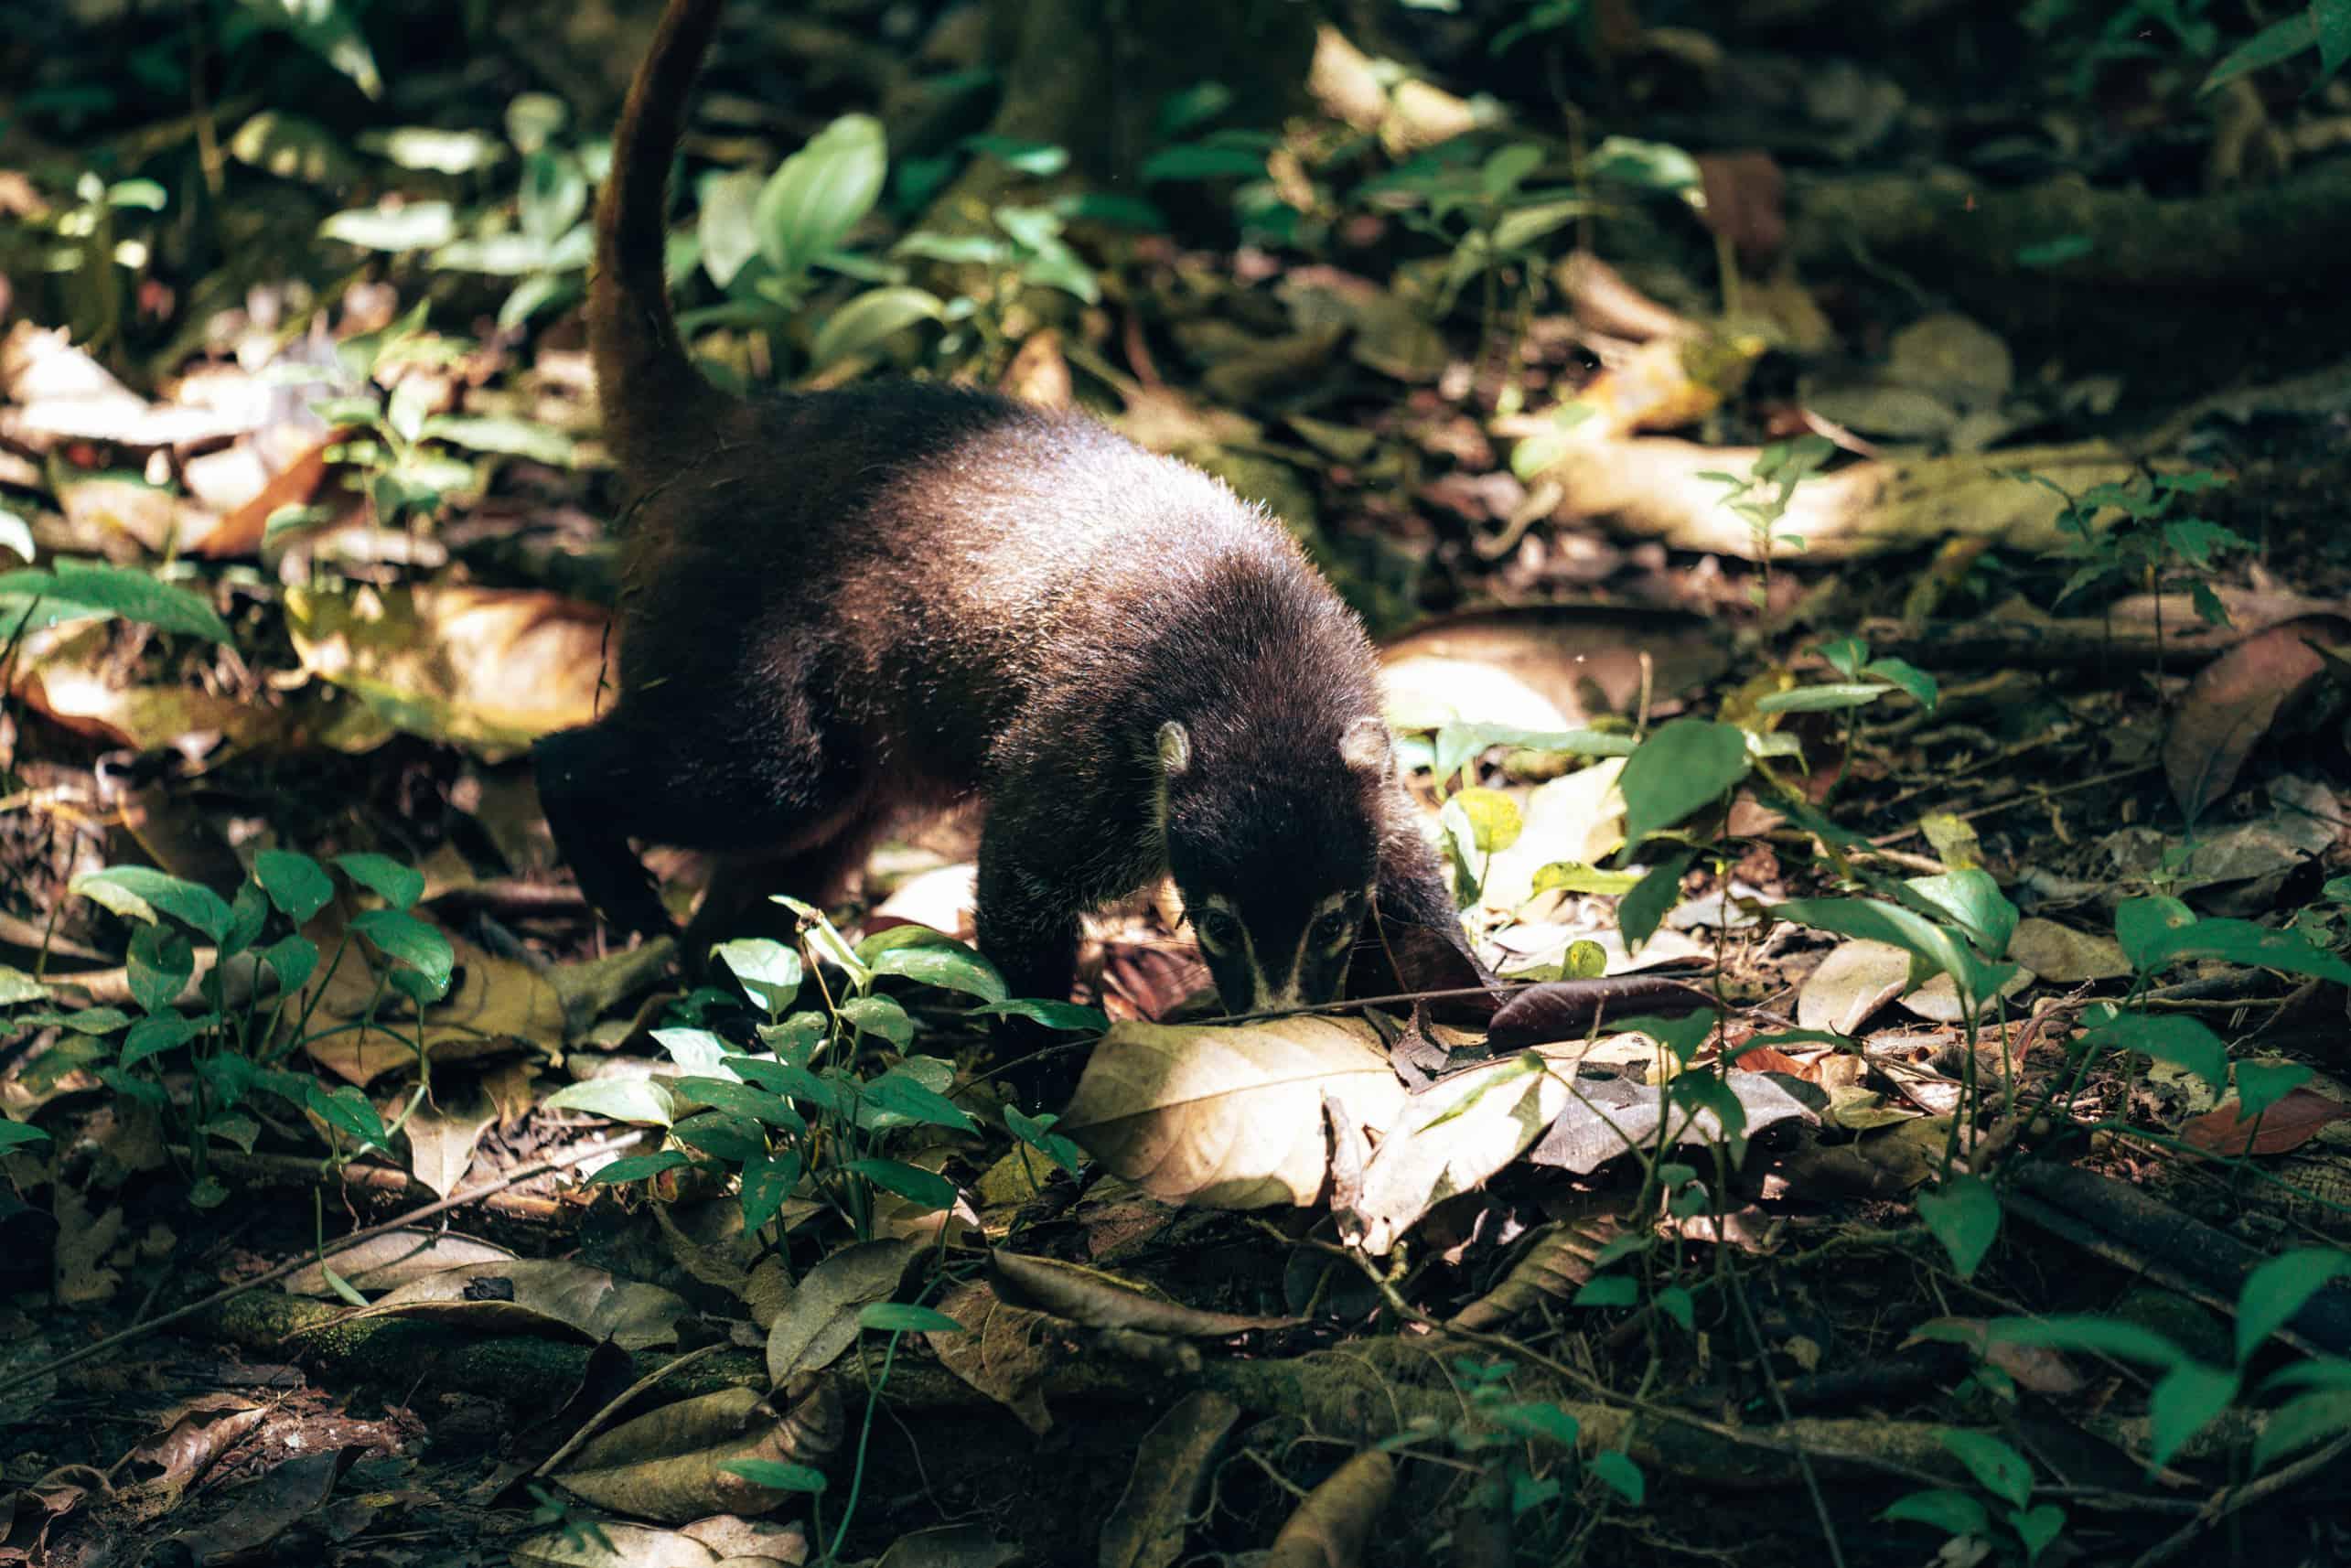 Coati Corcovado national park